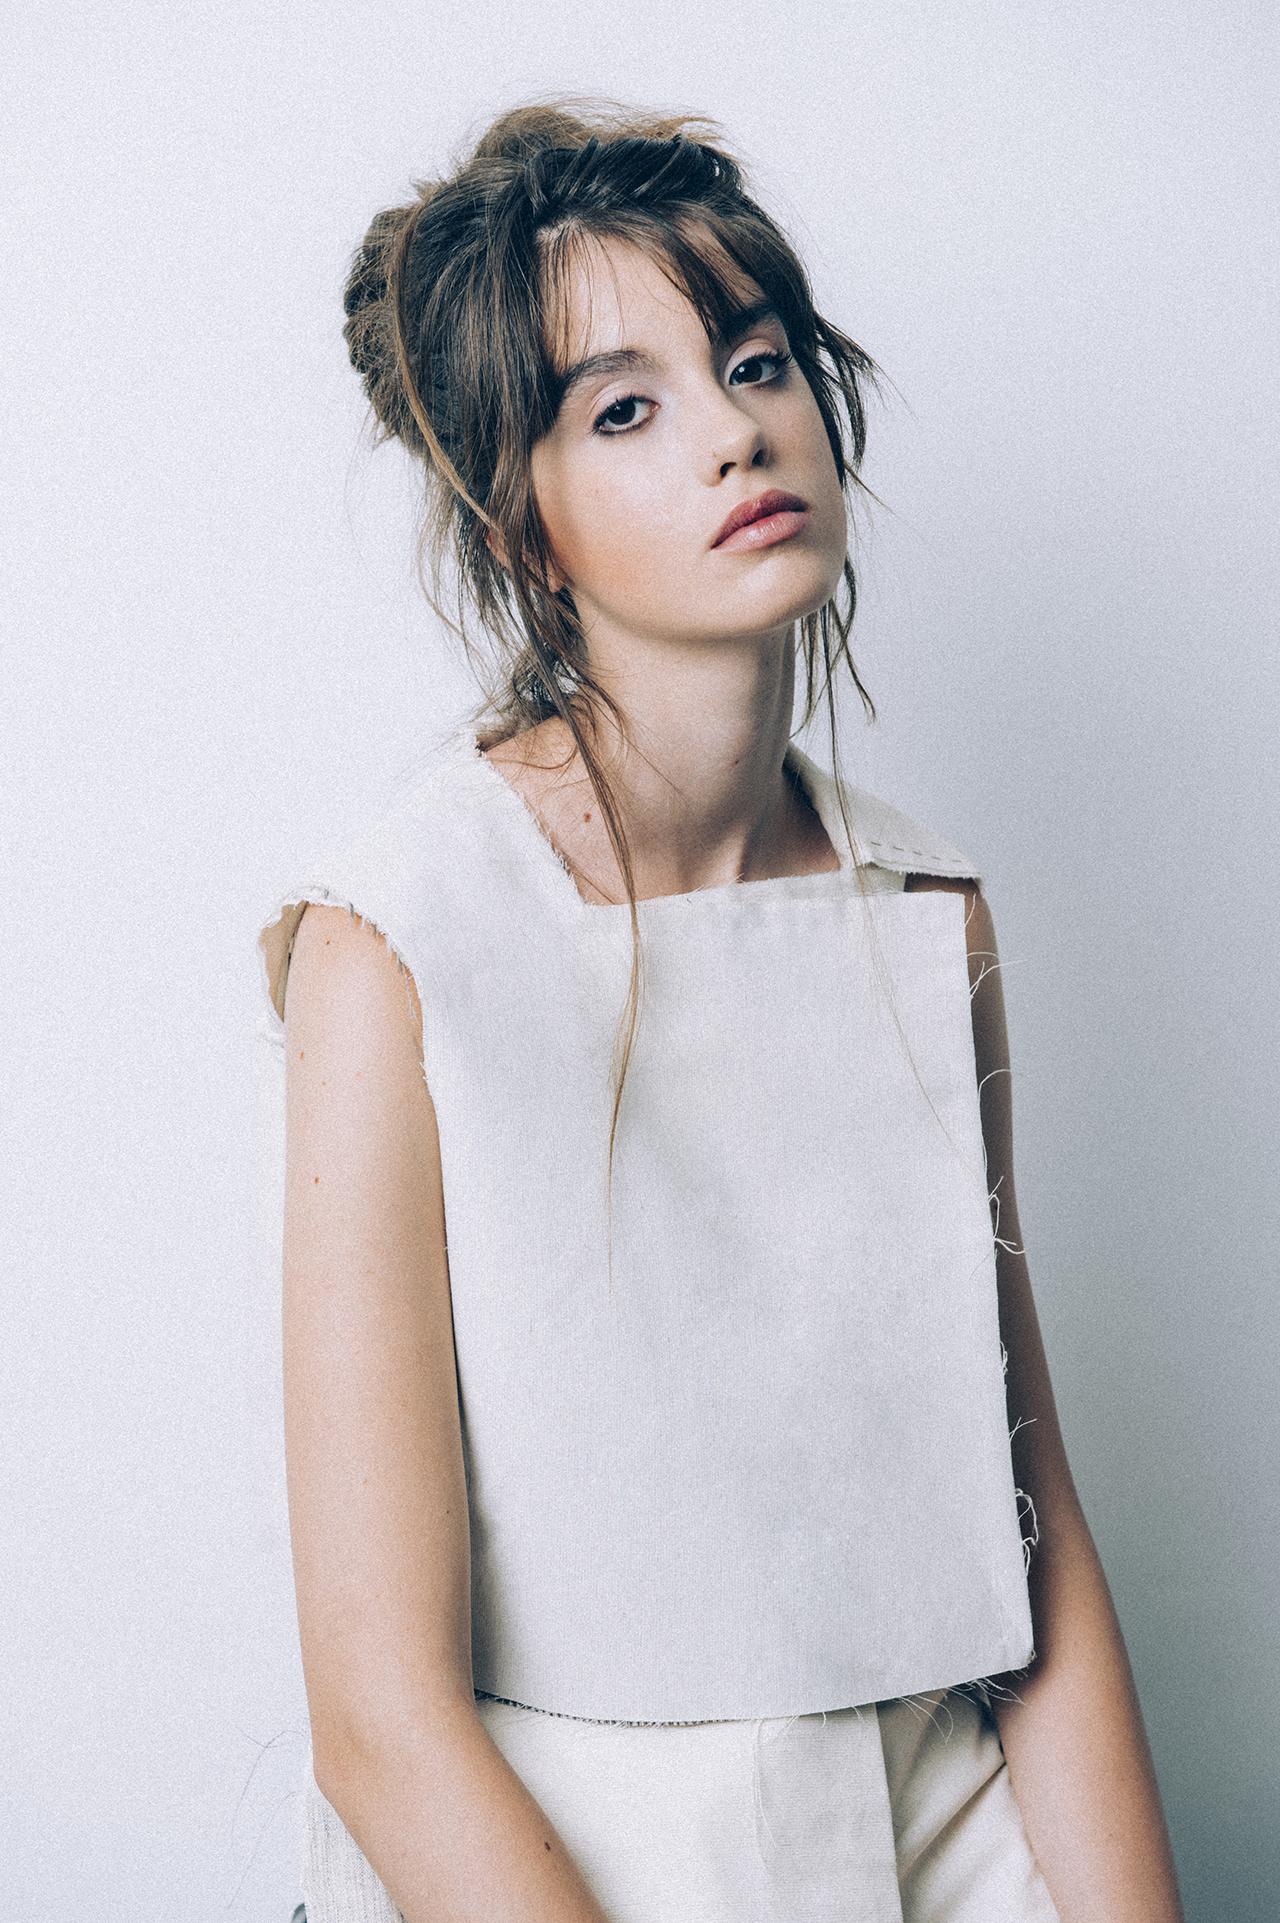 IDENHEUGEN  Published On 06 October 2015   Photography  Beatriz Maldonad  Model  Mariana @BlowModels  MUAH  Yolanda Calatayud  Clothing & Style  Chelsea Van Den Berg